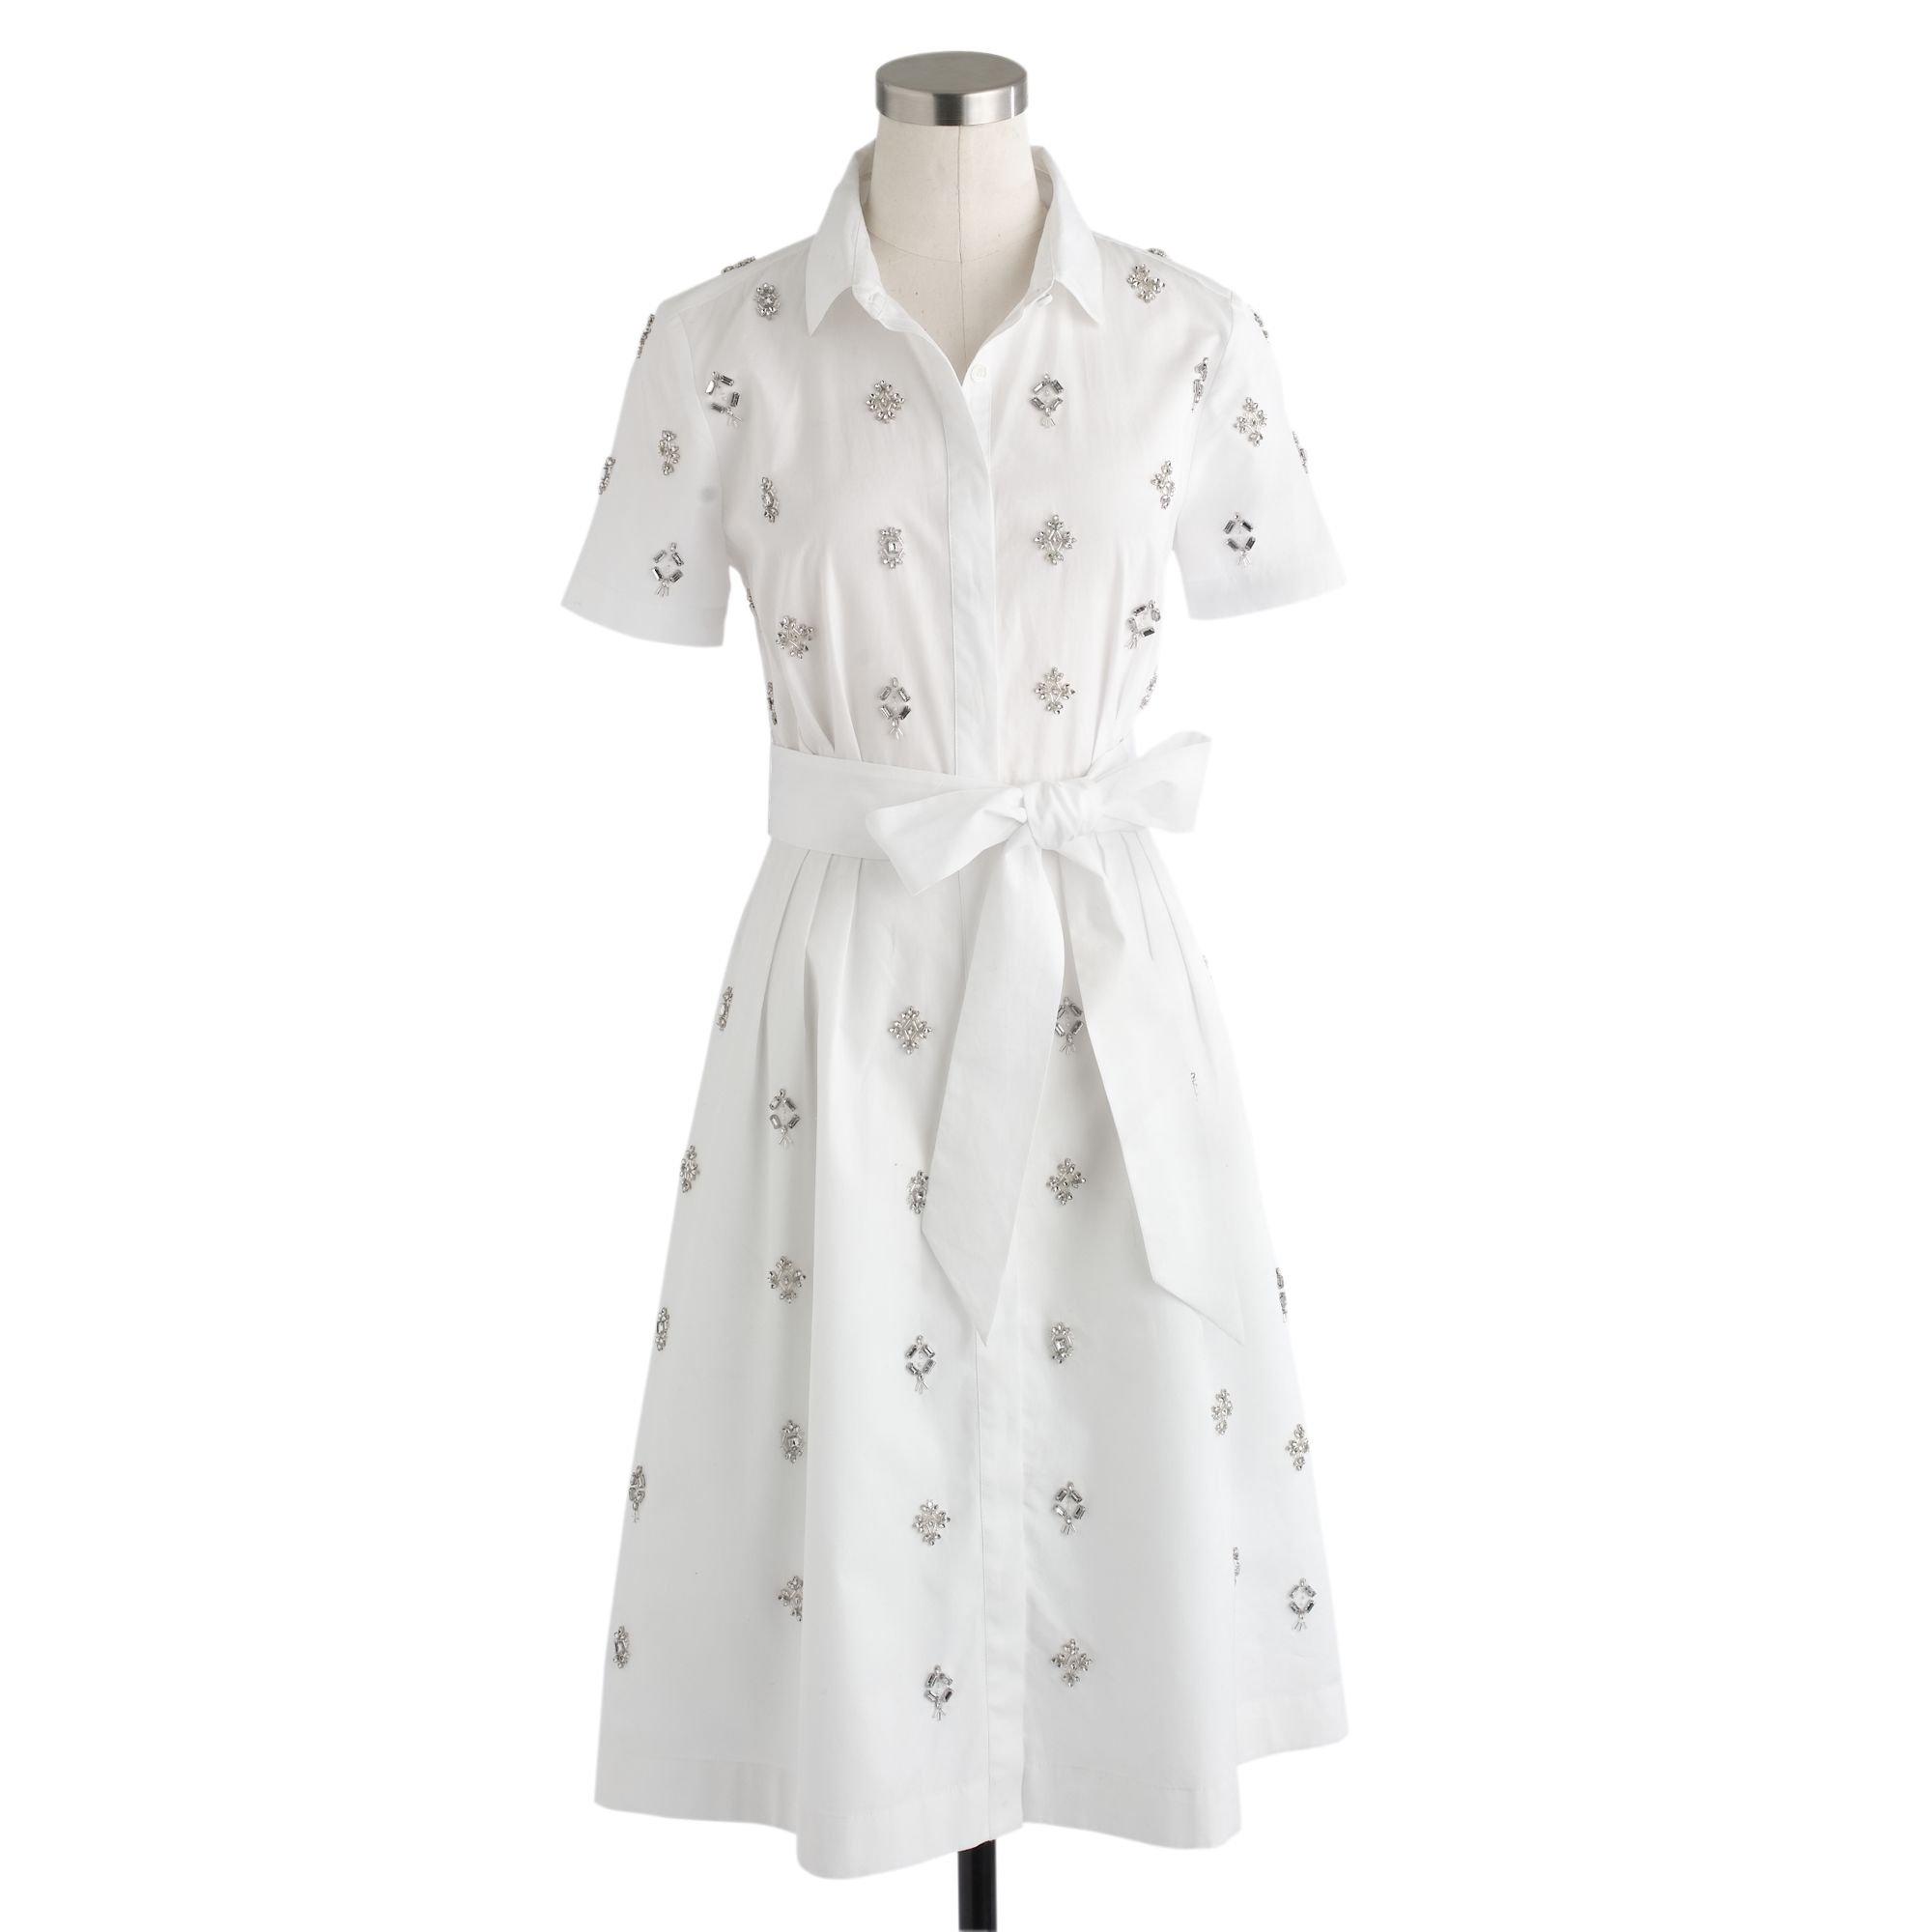 Collection Thomas Mason For Jcrew Shirtdress In